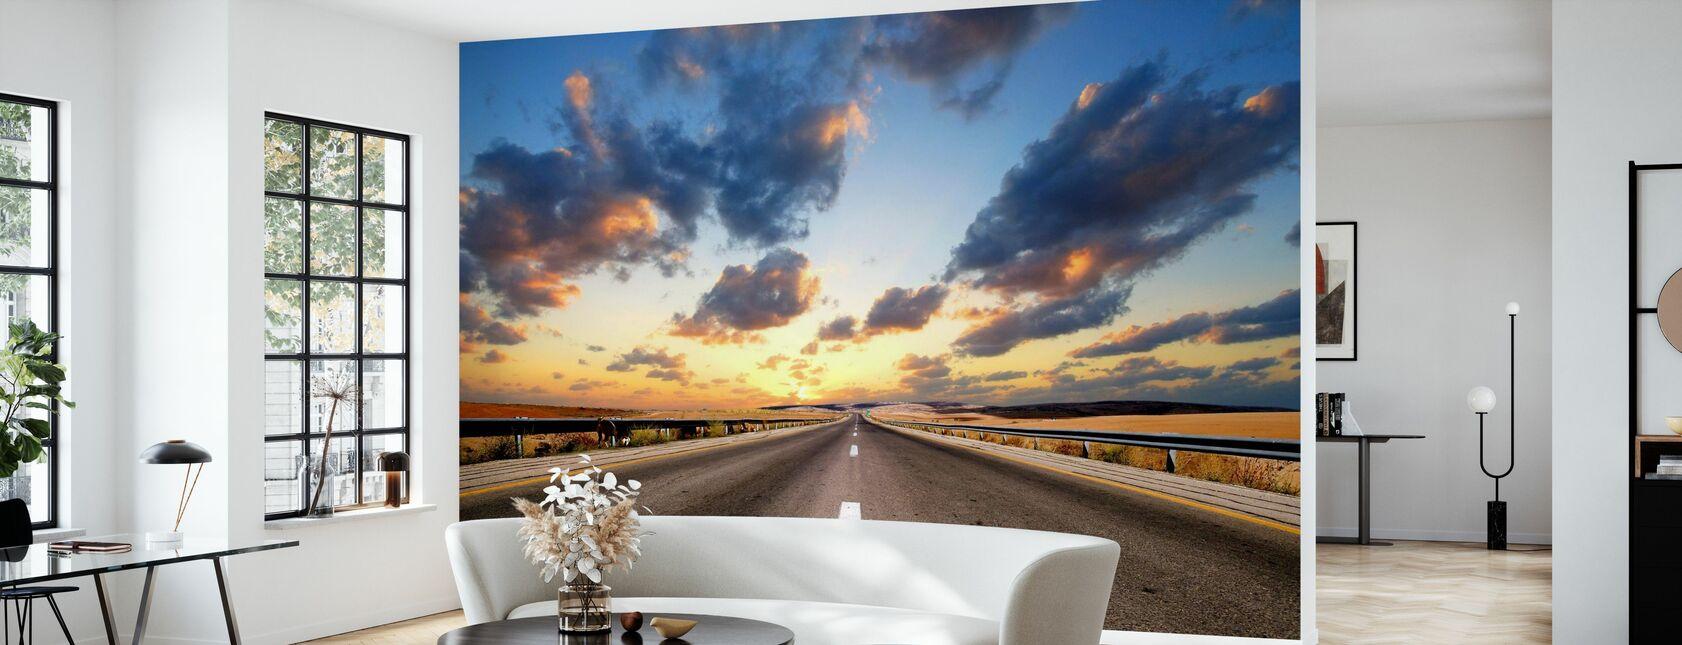 Road under Dramatic Sky - Wallpaper - Living Room